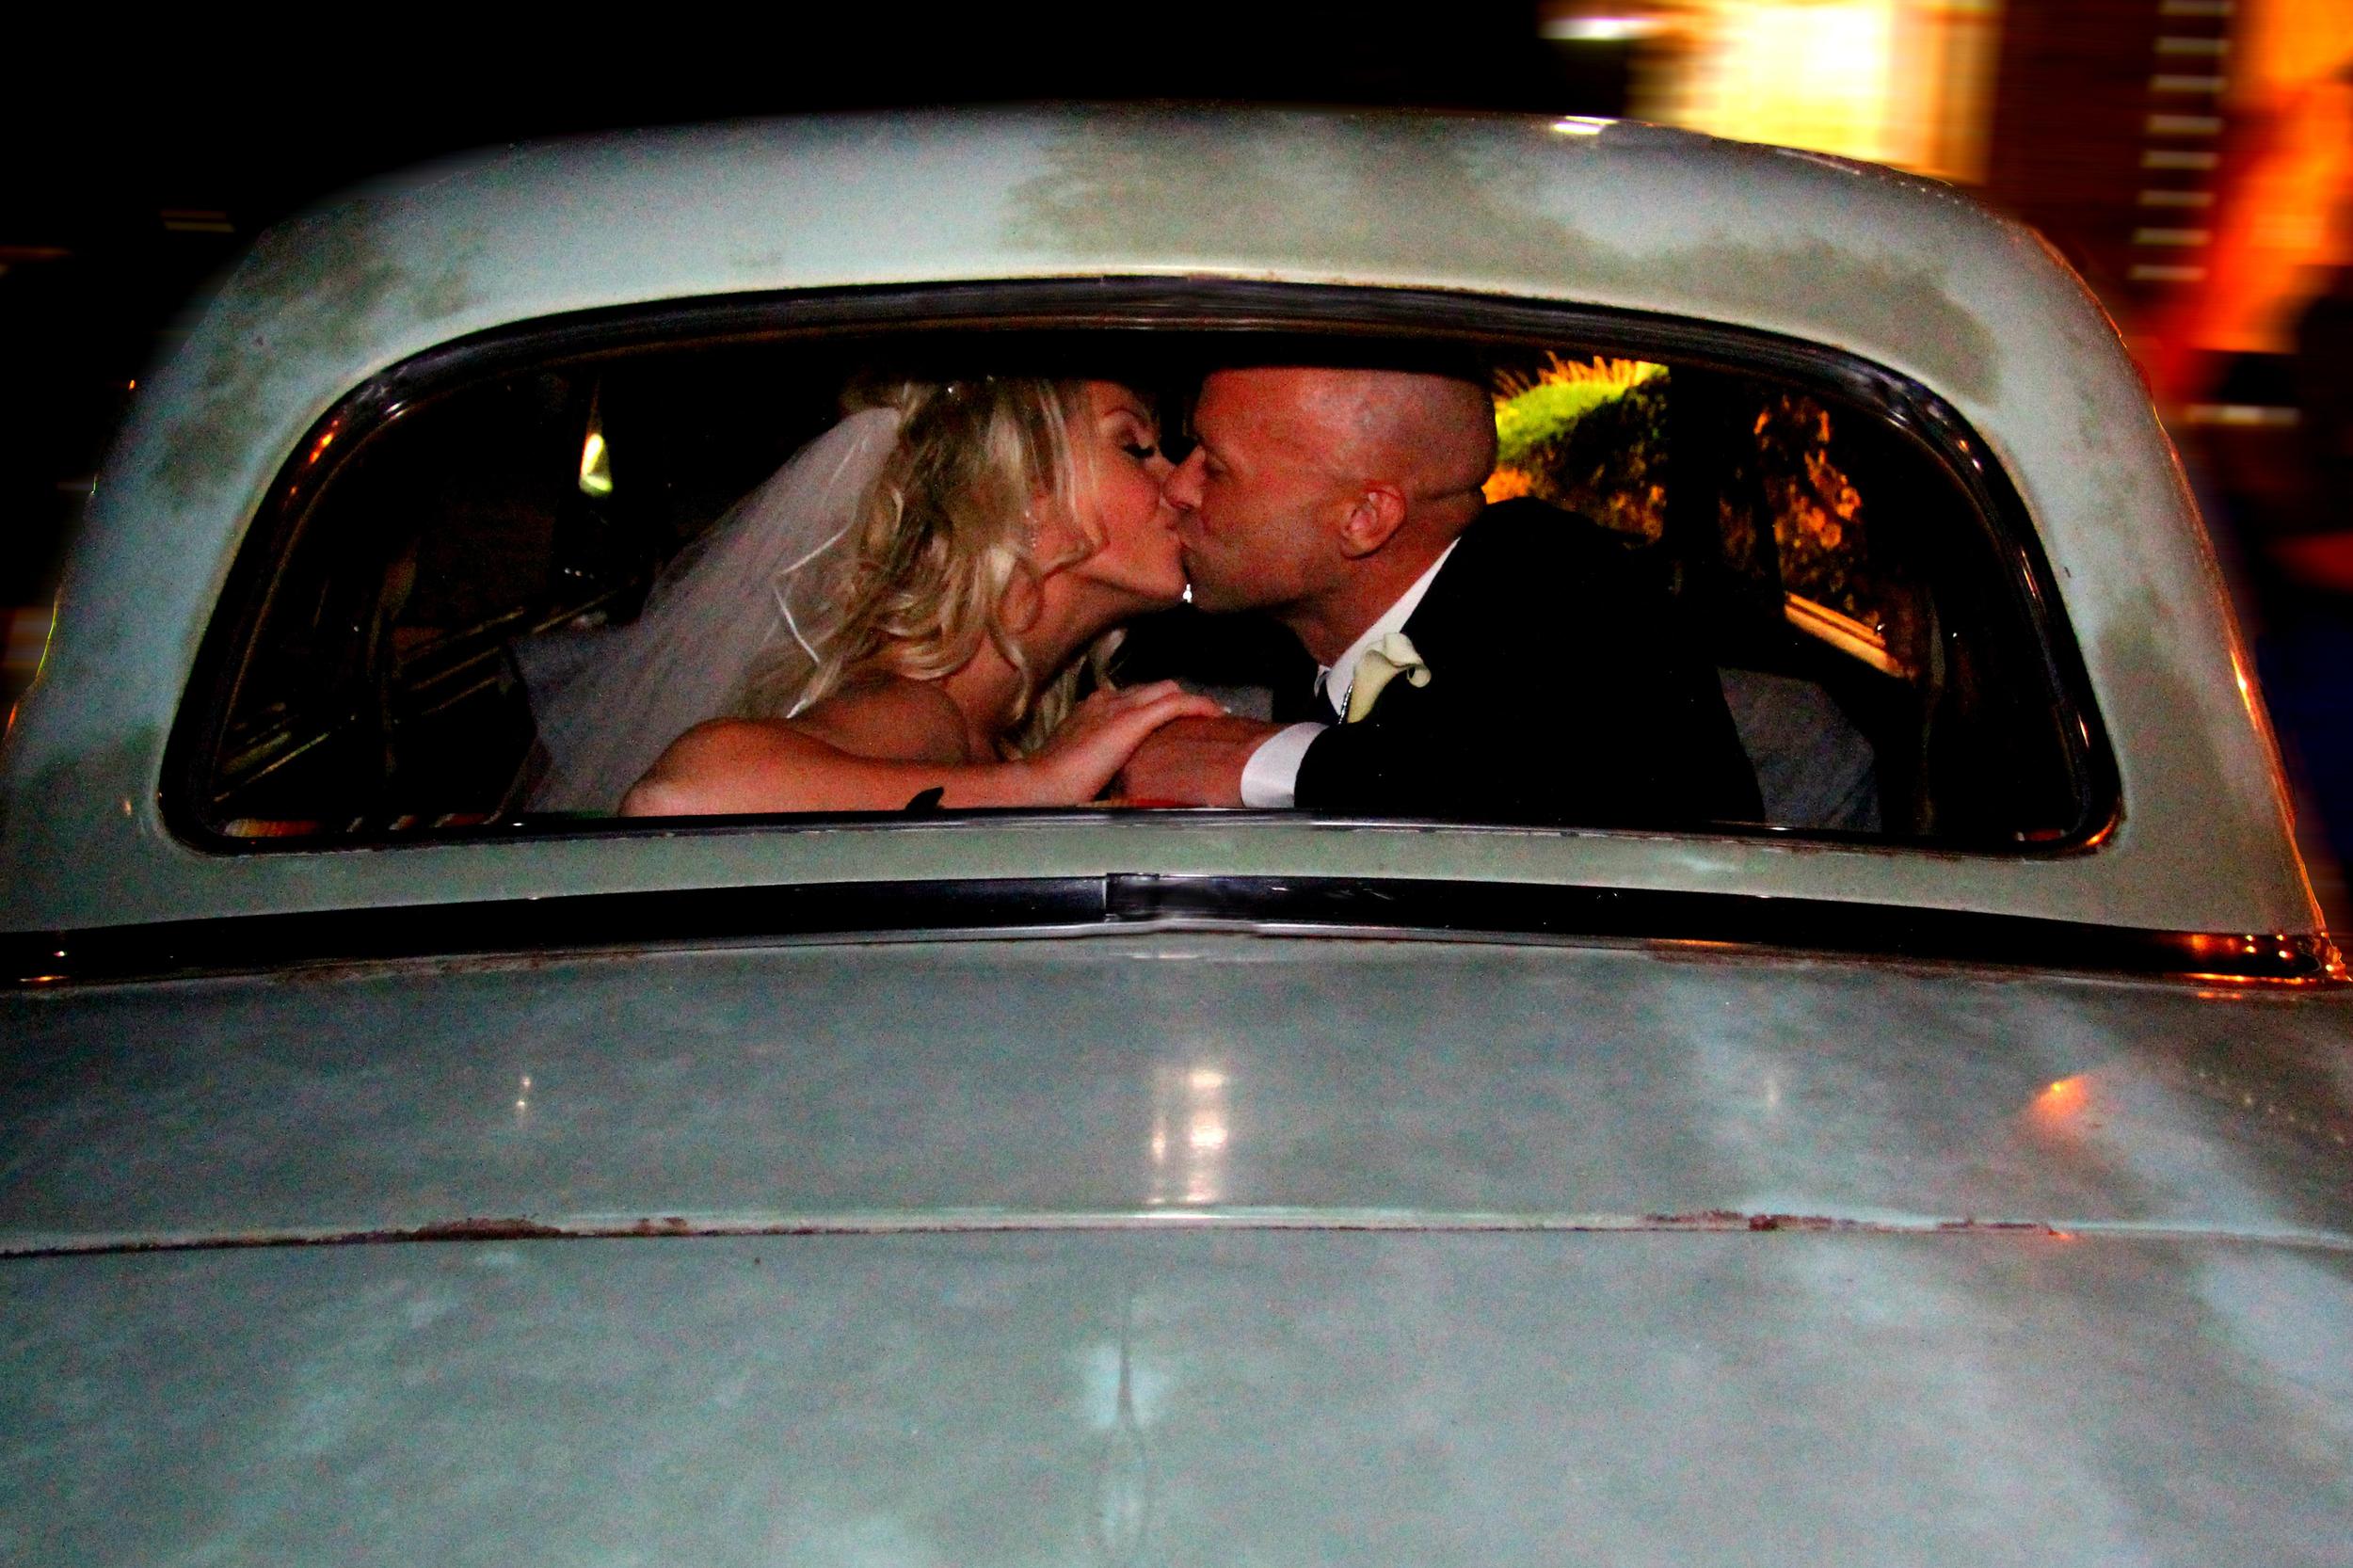 Davis County wedding photographer located in Bountiful Utah